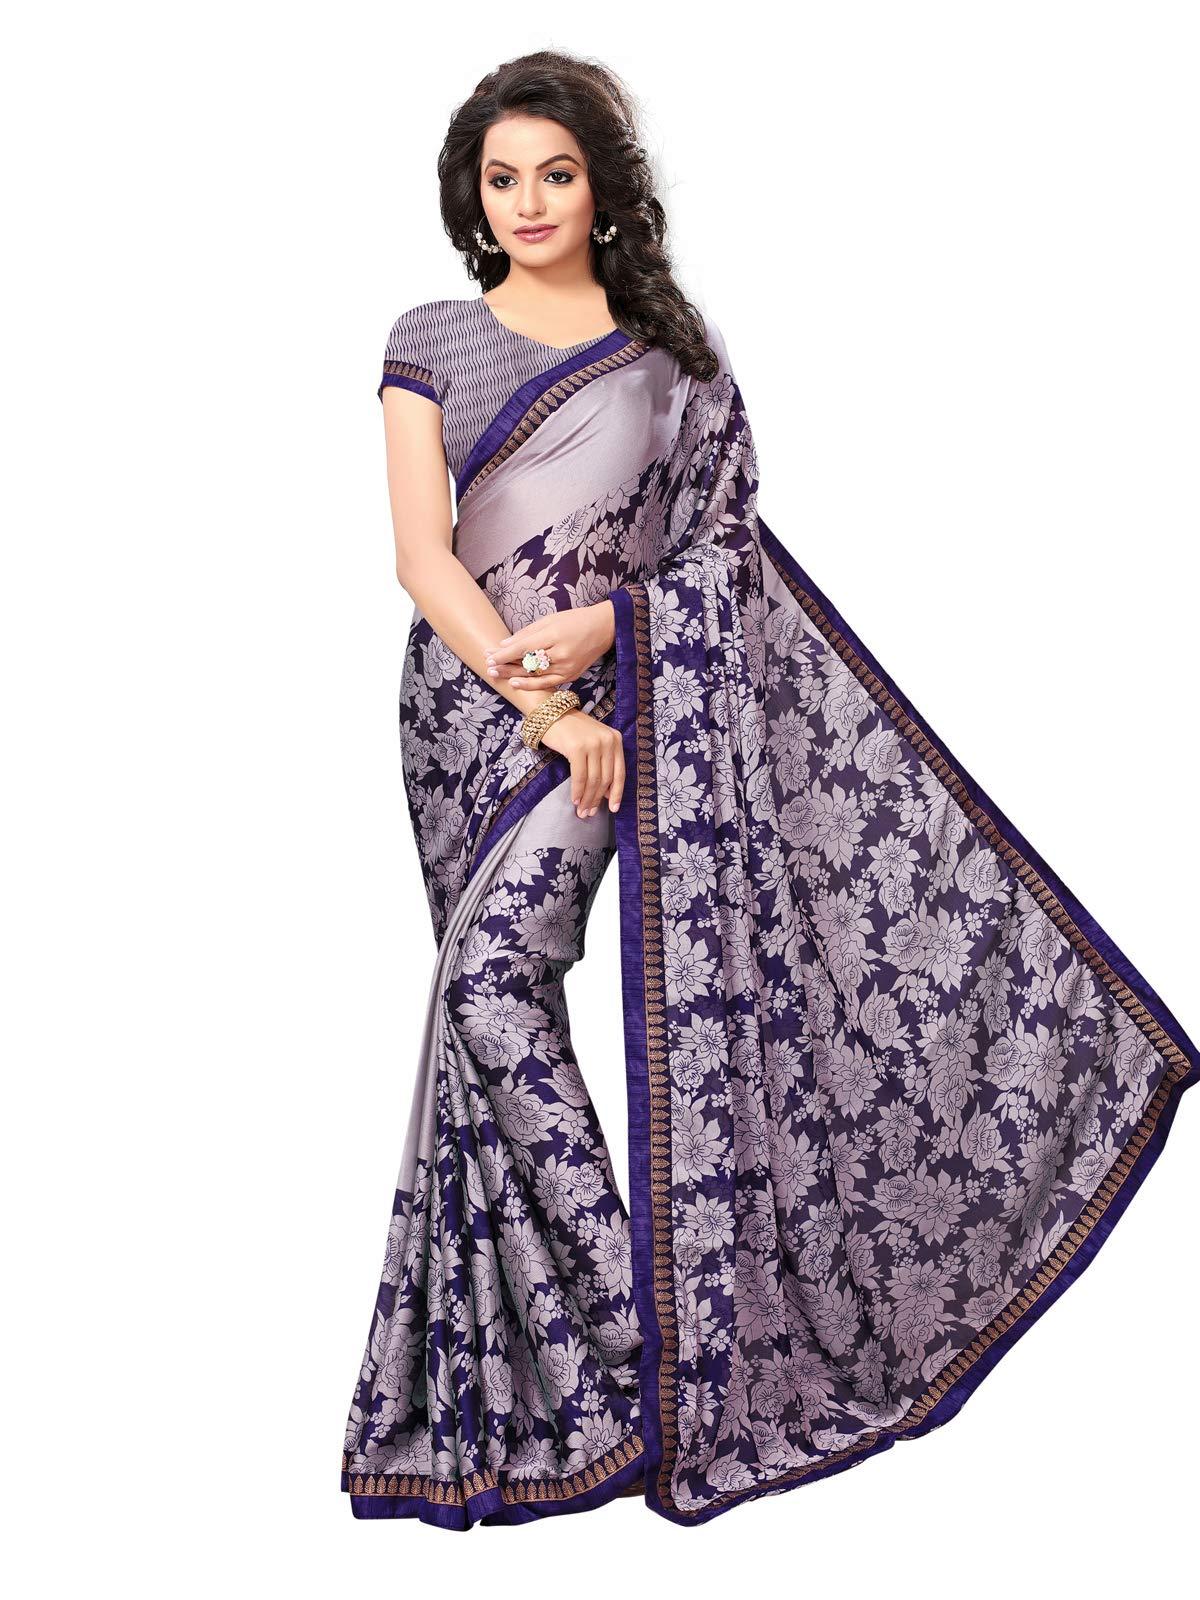 Kanchnar Women's Violet Chiffon Georgette Printed Saree677S4